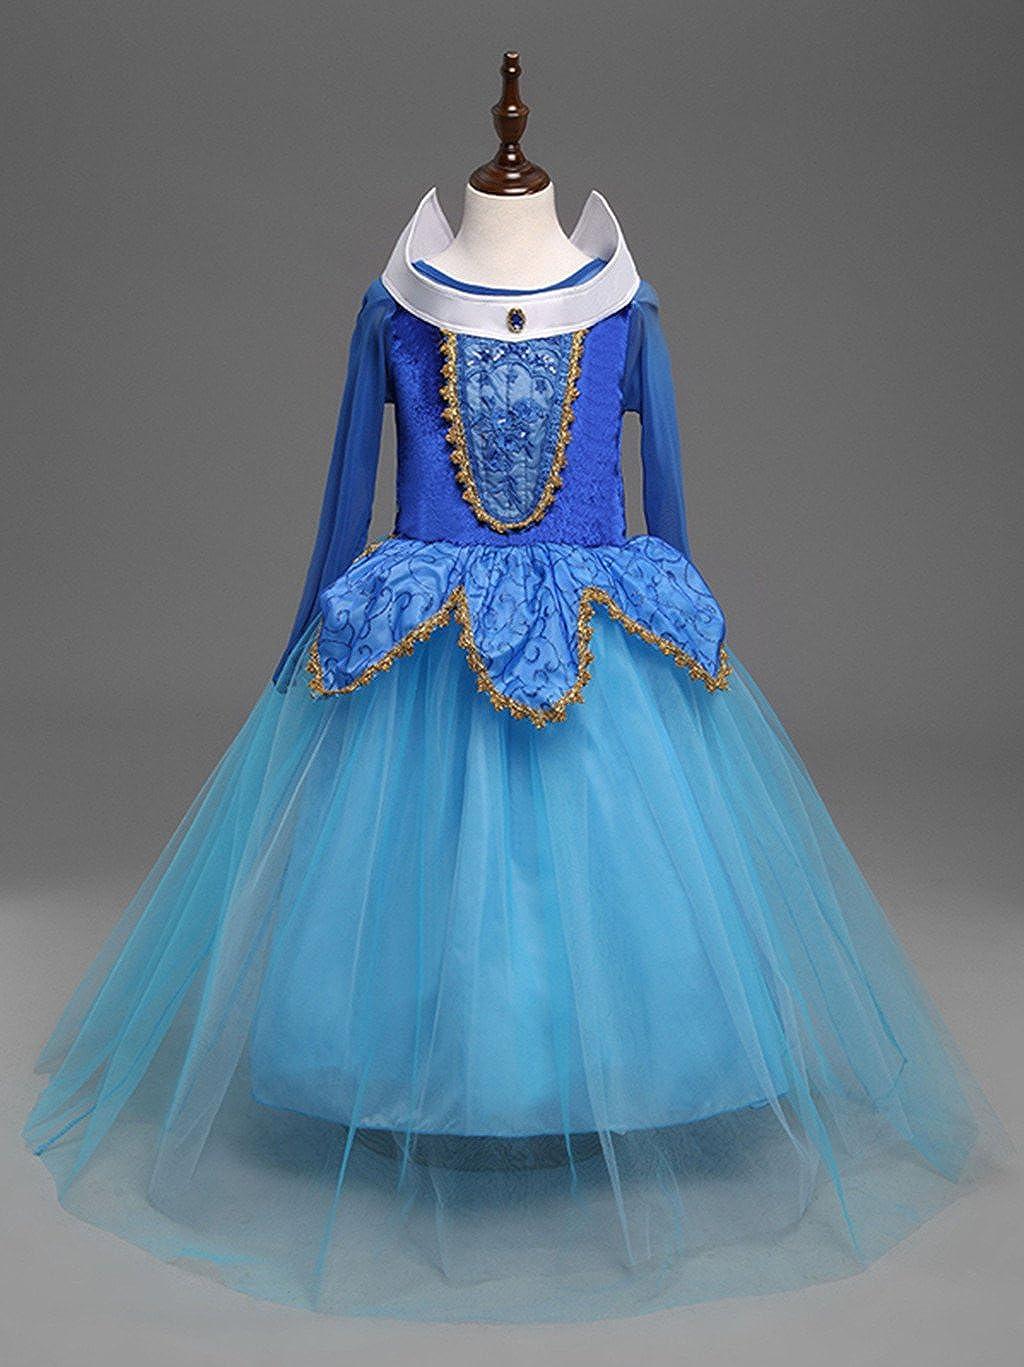 Amazon.com: DreamHigh Sleeping Beauty Princess Aurora Party Girls ...